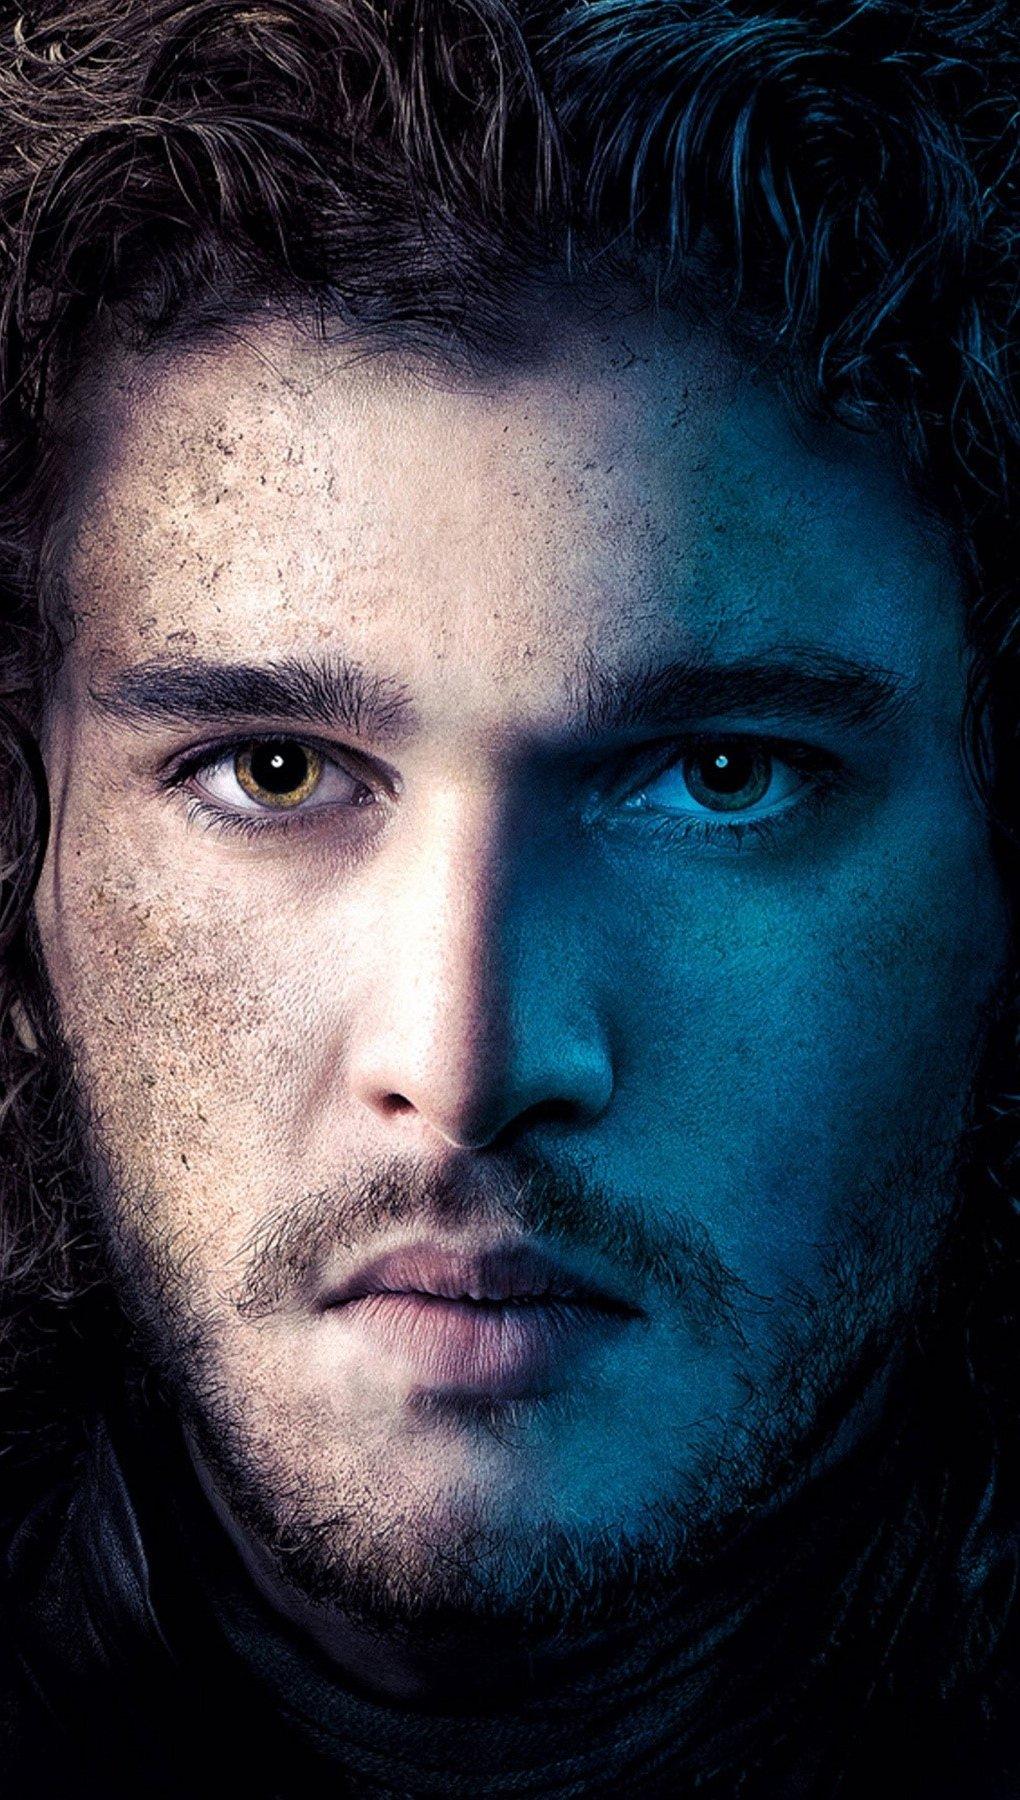 Wallpaper Jon Snow of Game of Thrones Vertical